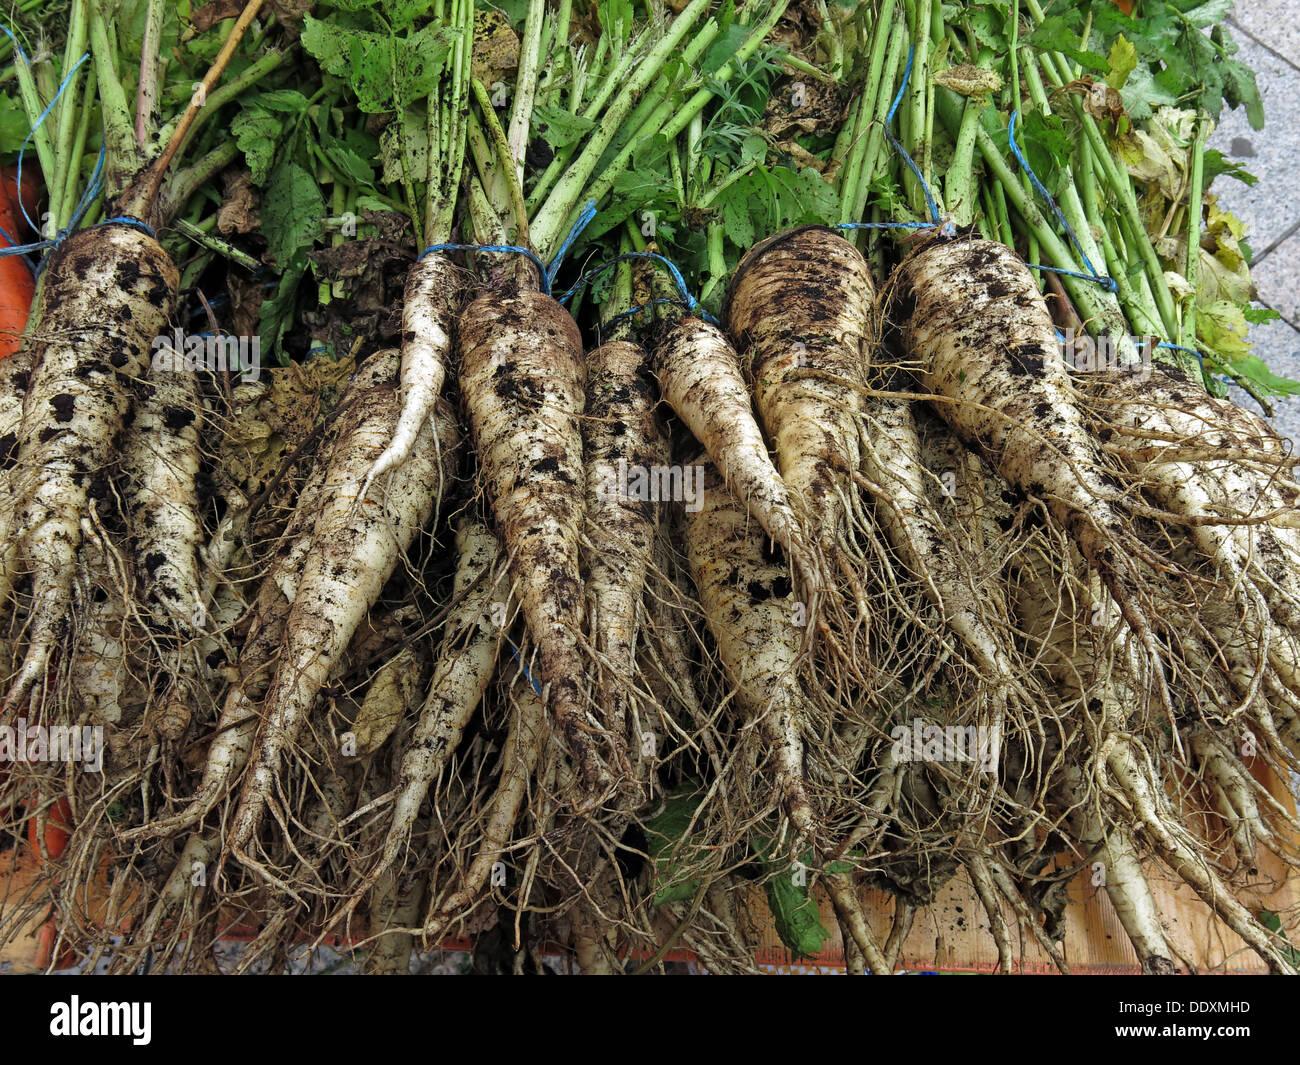 Dirty Organic Parsnips on sale at Farmers Market, Warrington, Cheshire, England, UK - Stock Image